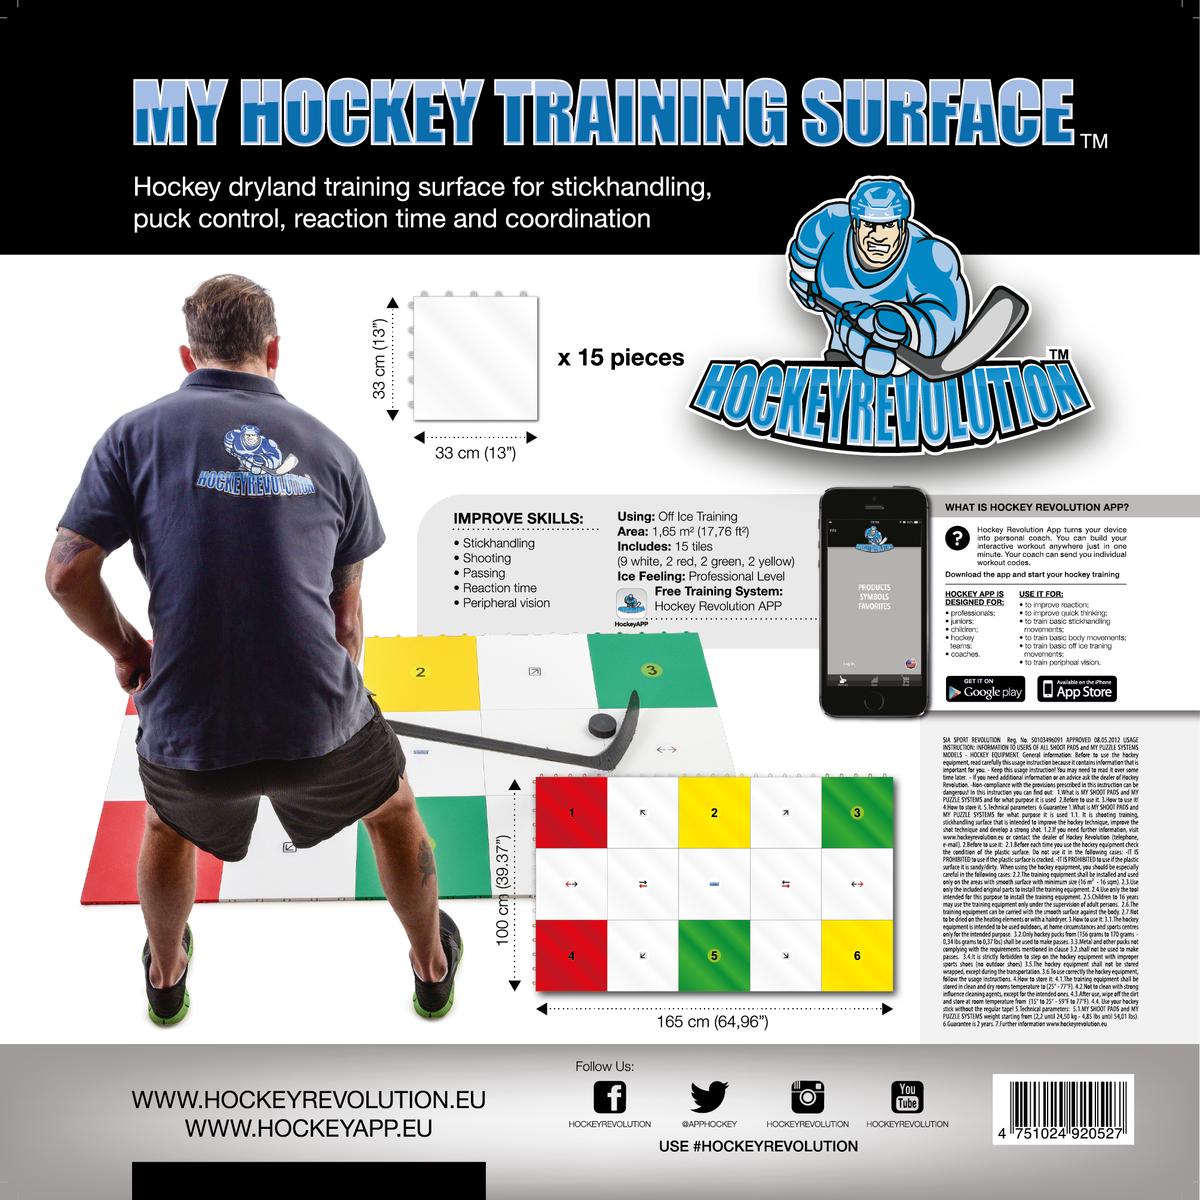 MyHockeyTrainingSurface_kaste-330x330-Drukai-01_preview